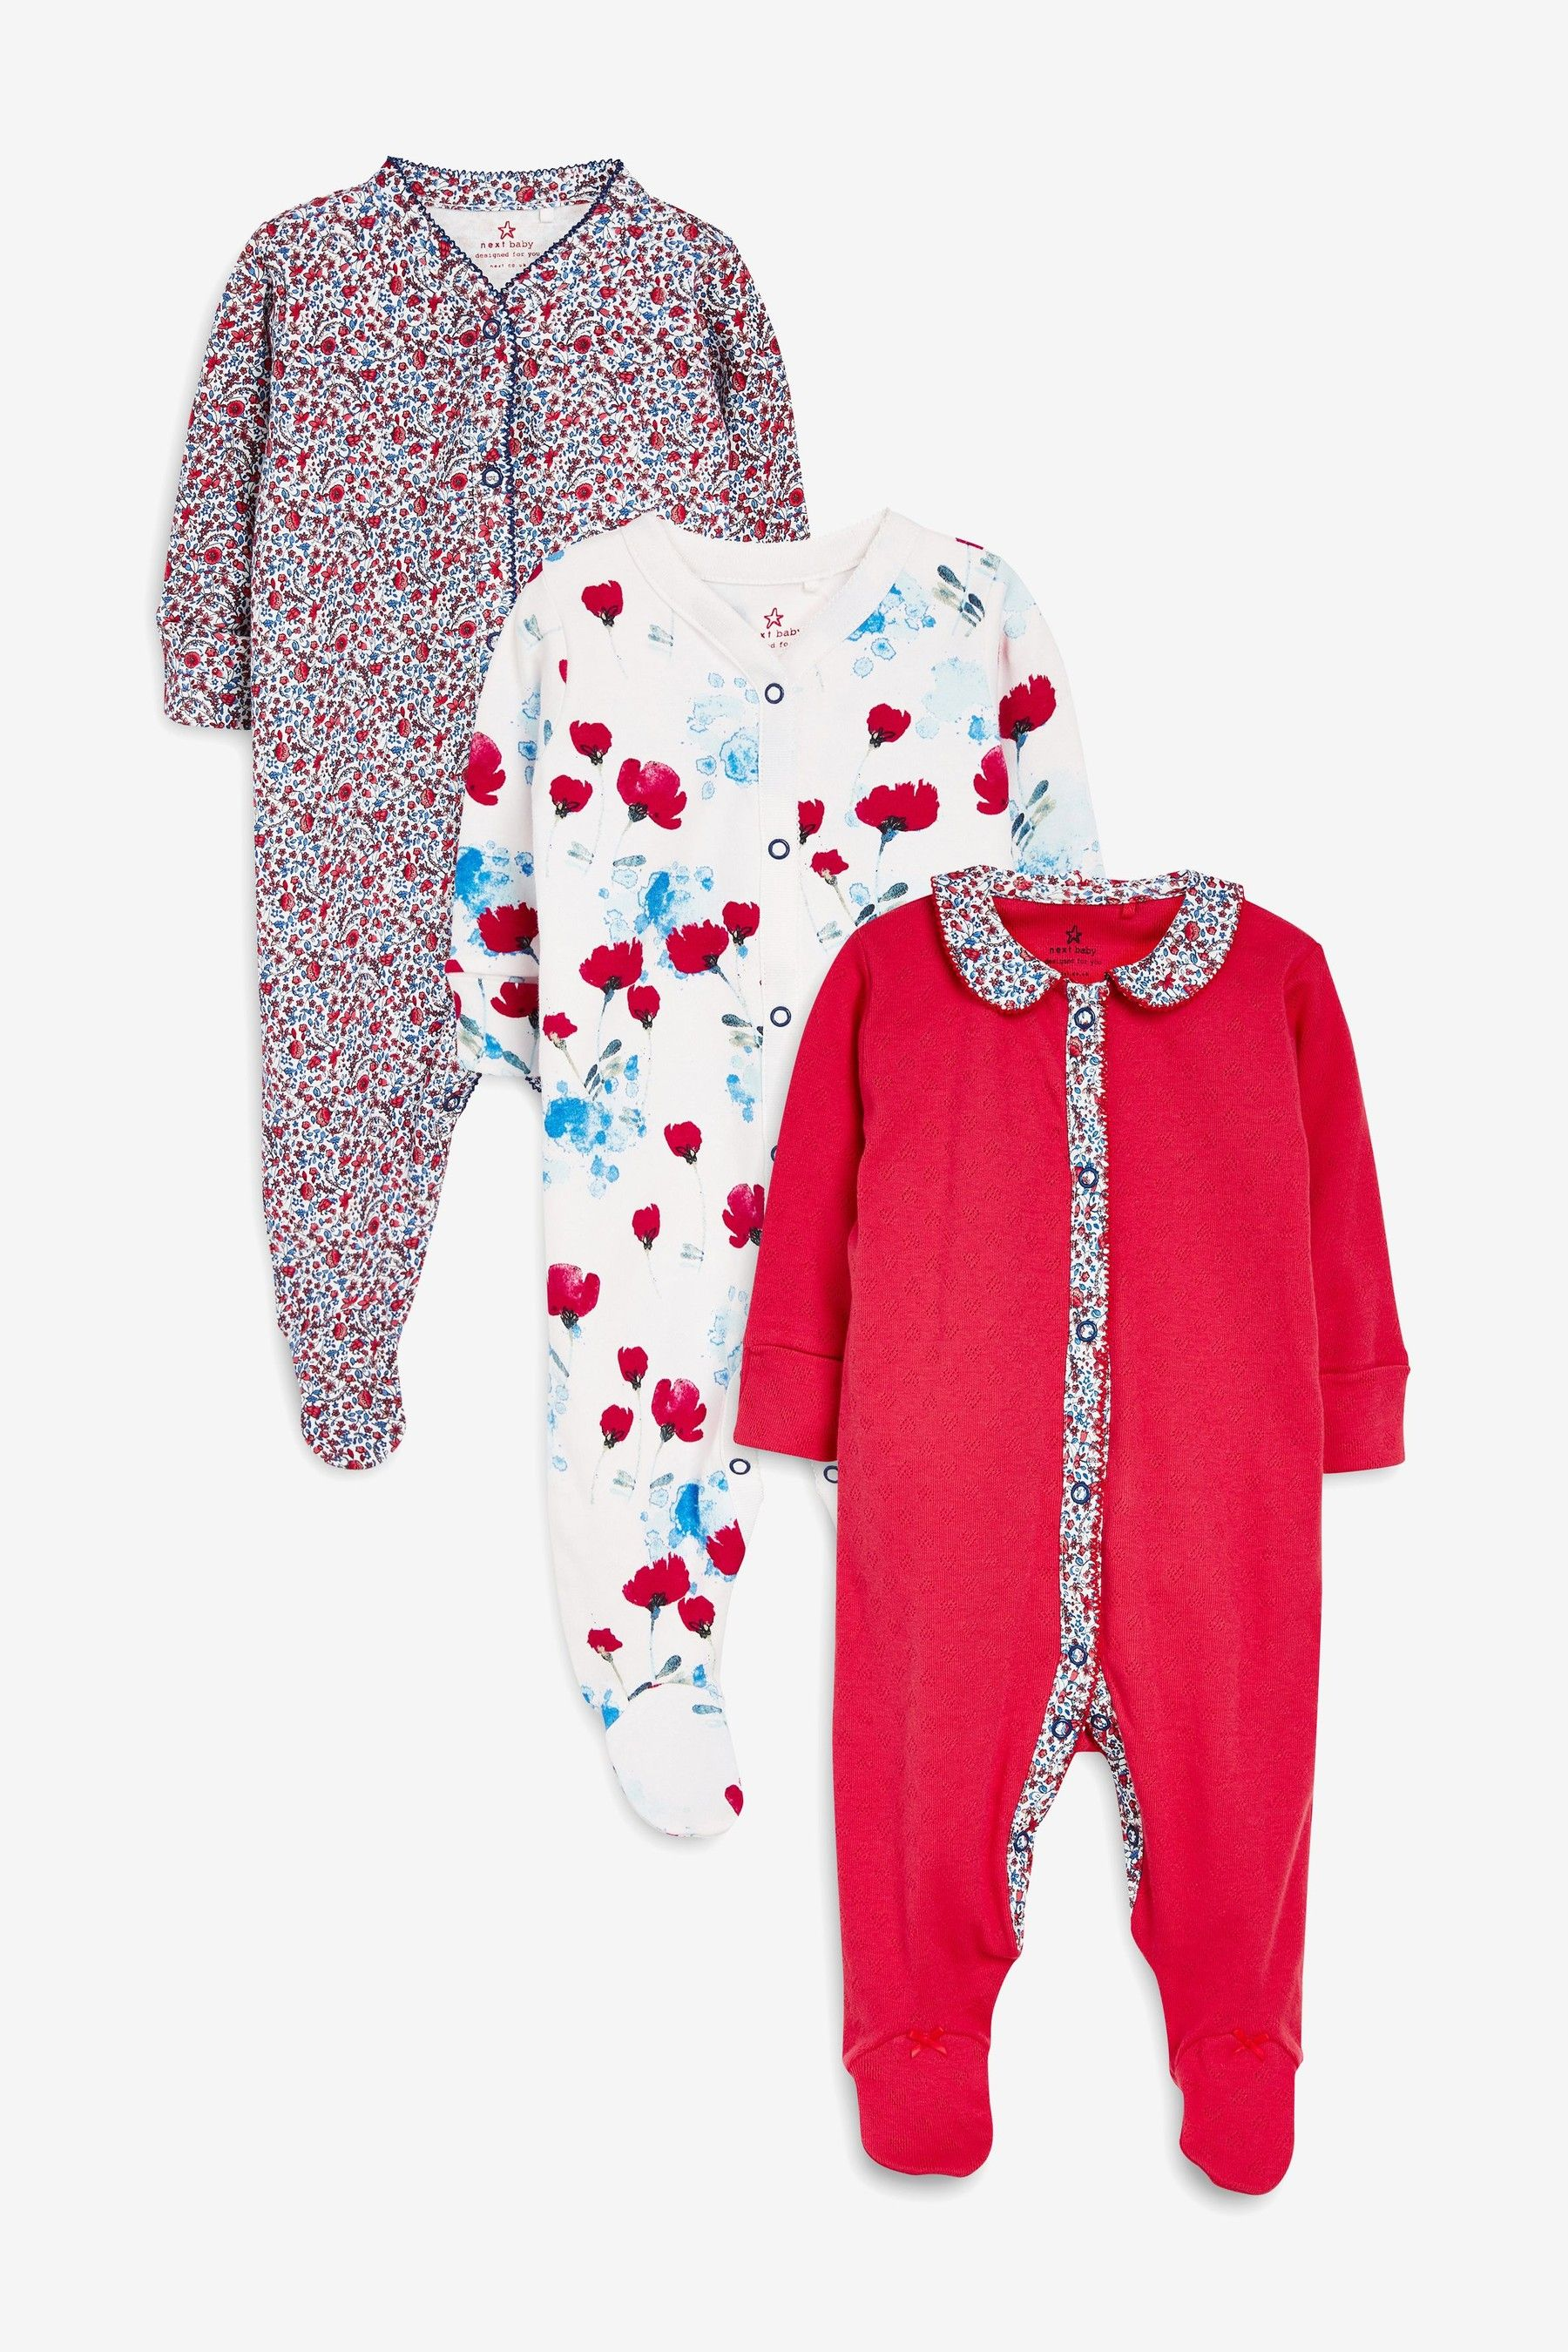 Toddler Baby Girls Bodysuit Short-Sleeve Onesie Heart Dance Print Jumpsuit Winter Pajamas